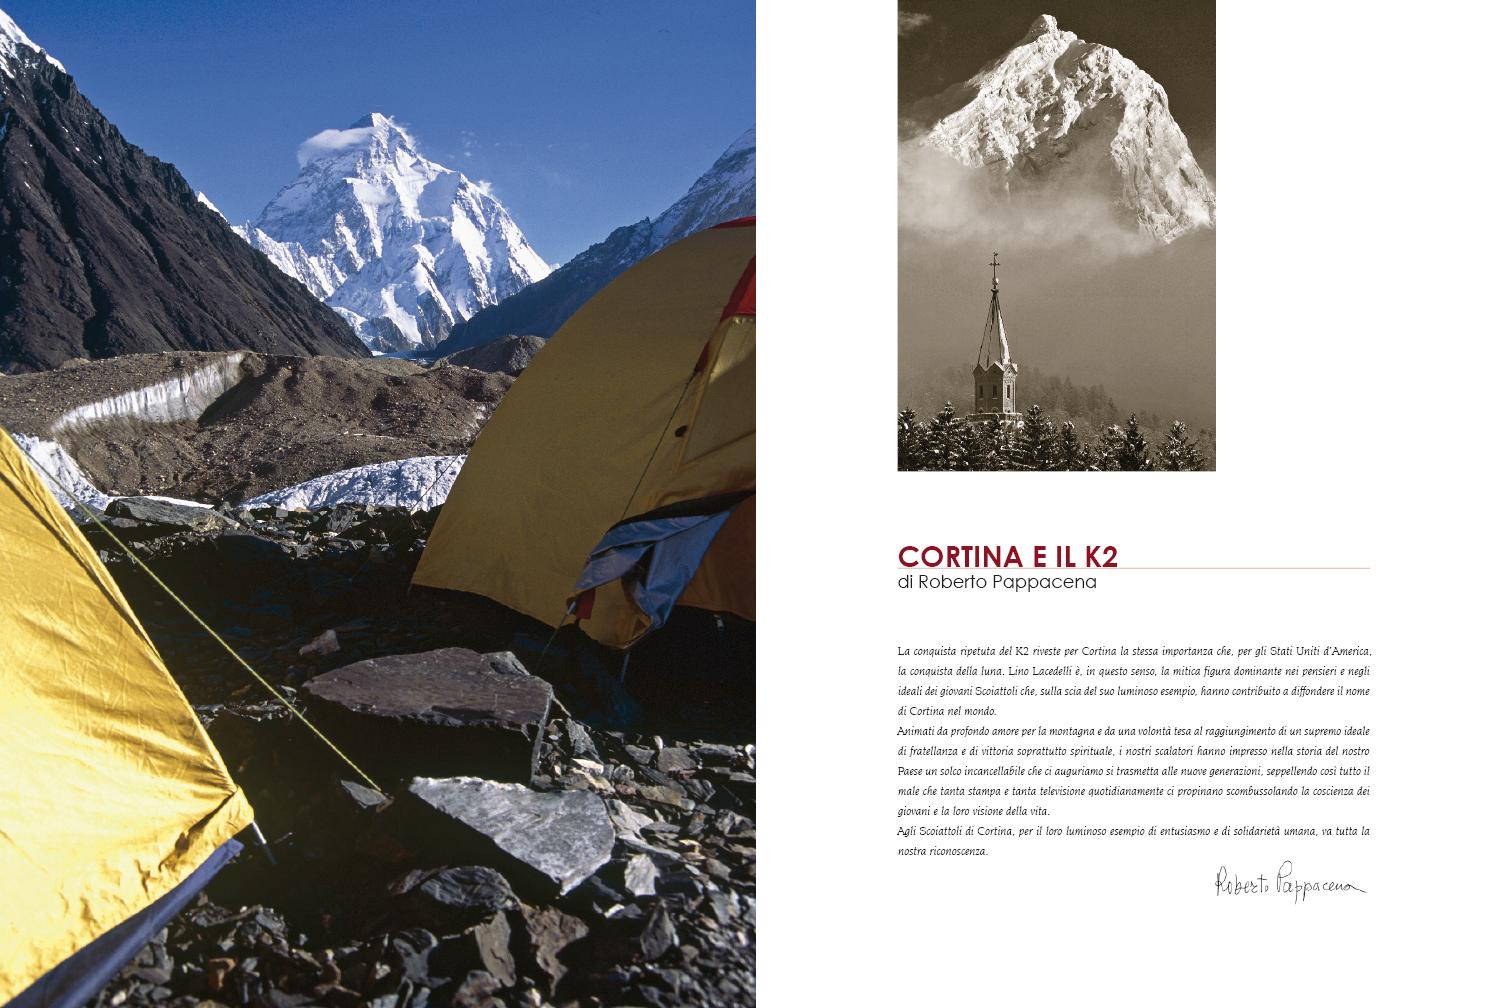 K2 EXPEDITION 1954-2004 Giuseppe Ghedina Fotografo - 005.jpg